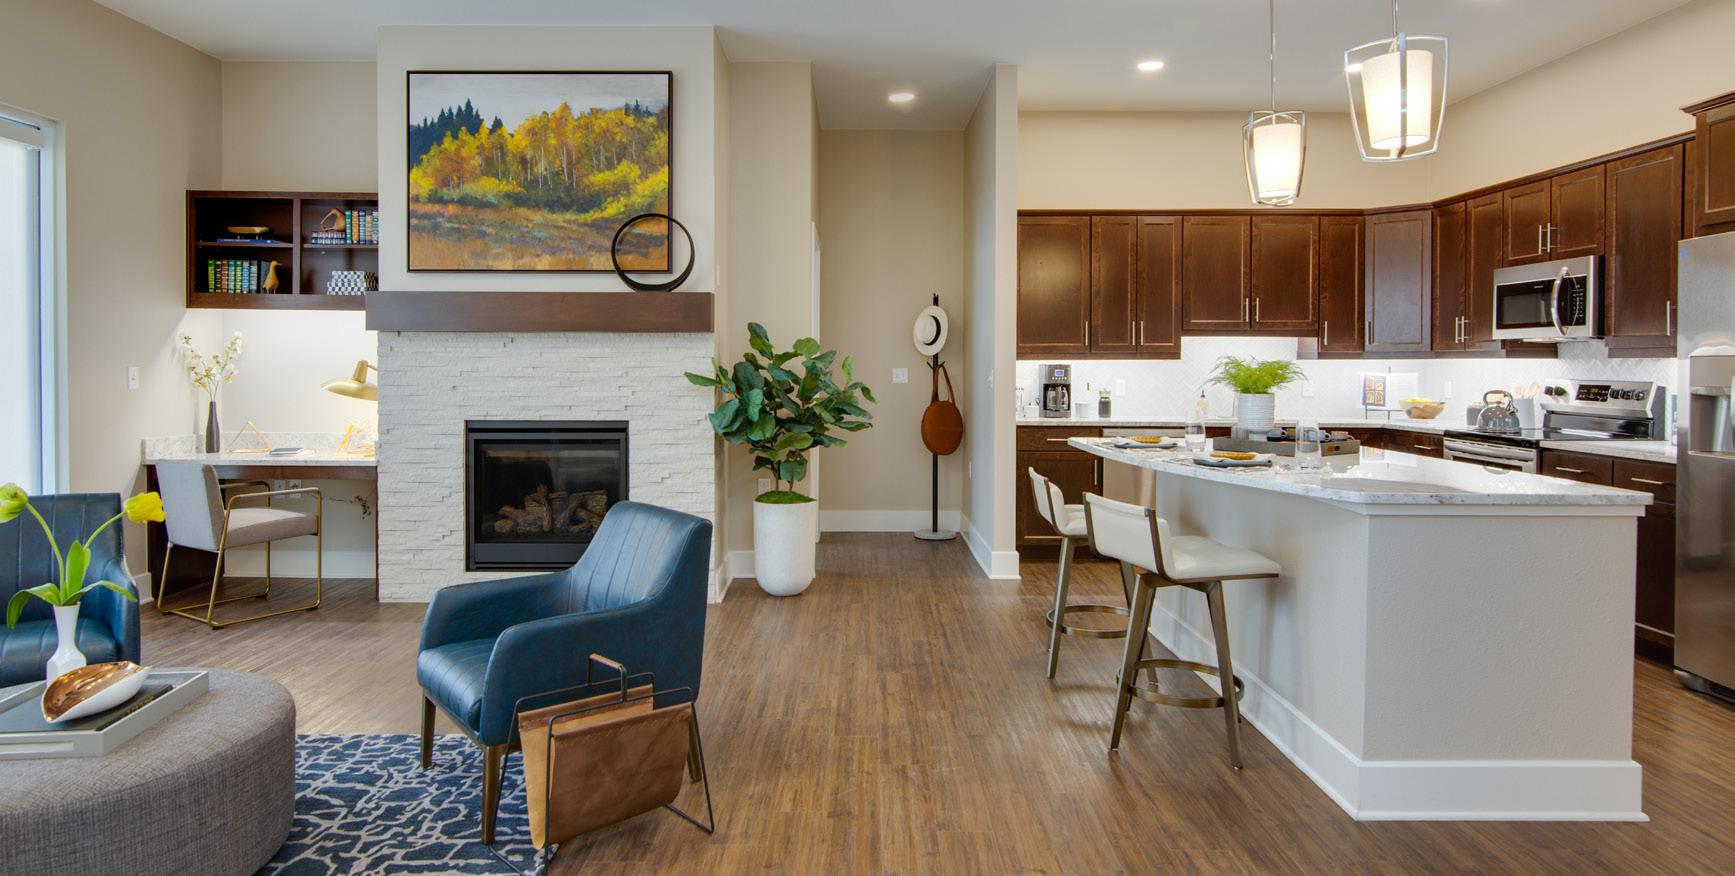 Compare At Home vs Senior Living Costs The Ridge Pinehurst